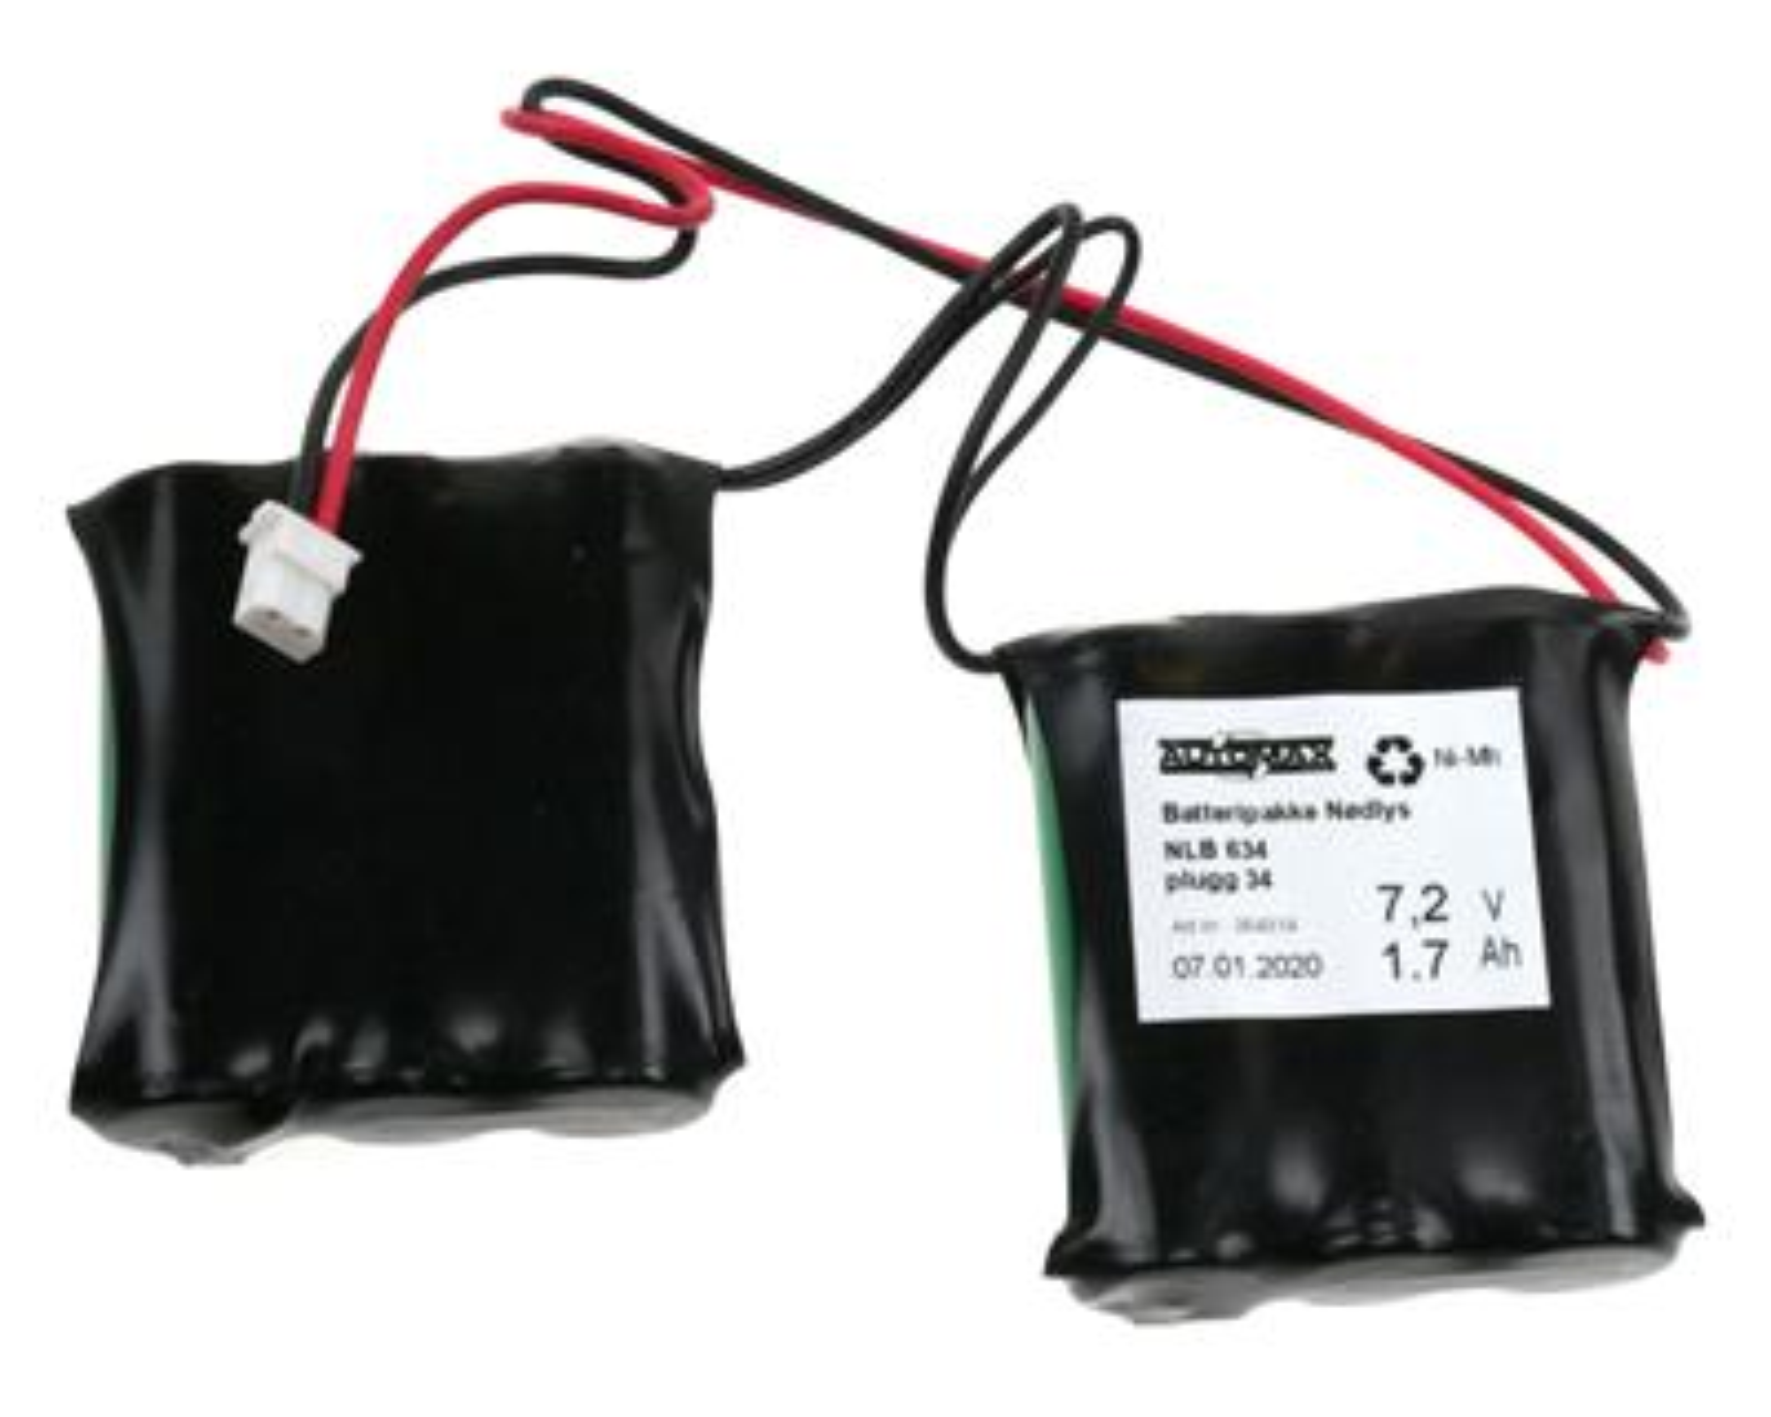 NLB 634 7,2V-1,7Ah 2Rx3 Plugg 34